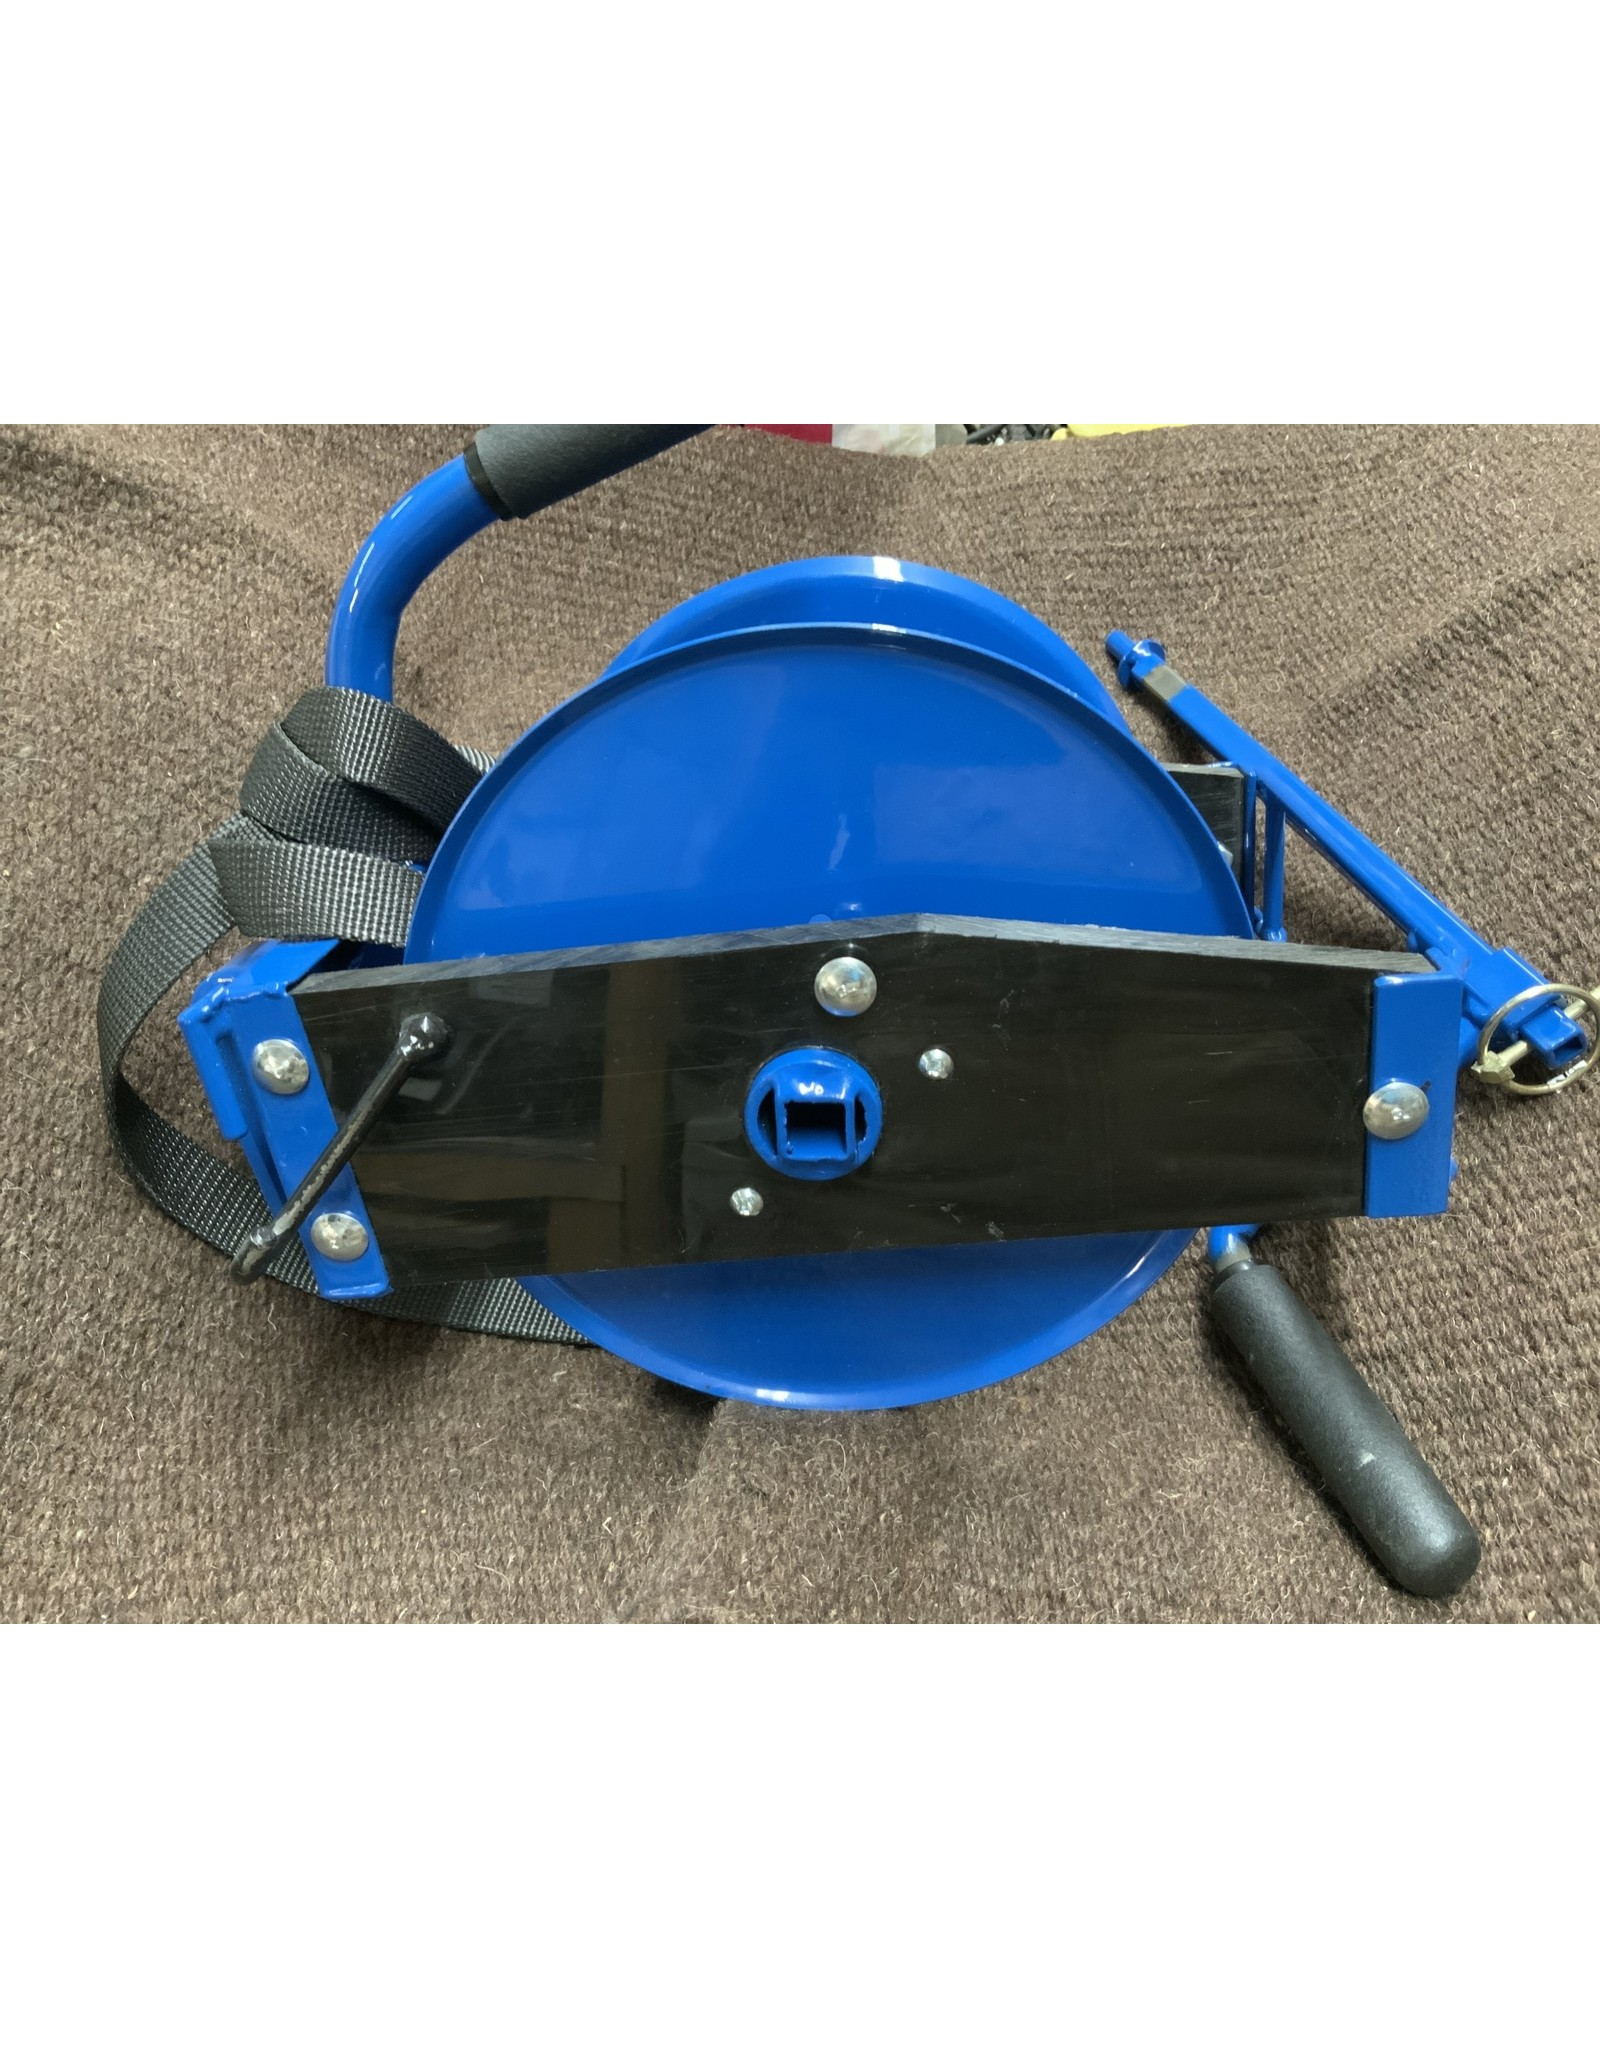 7L Mini Power Reel - Manual or Drill Powered